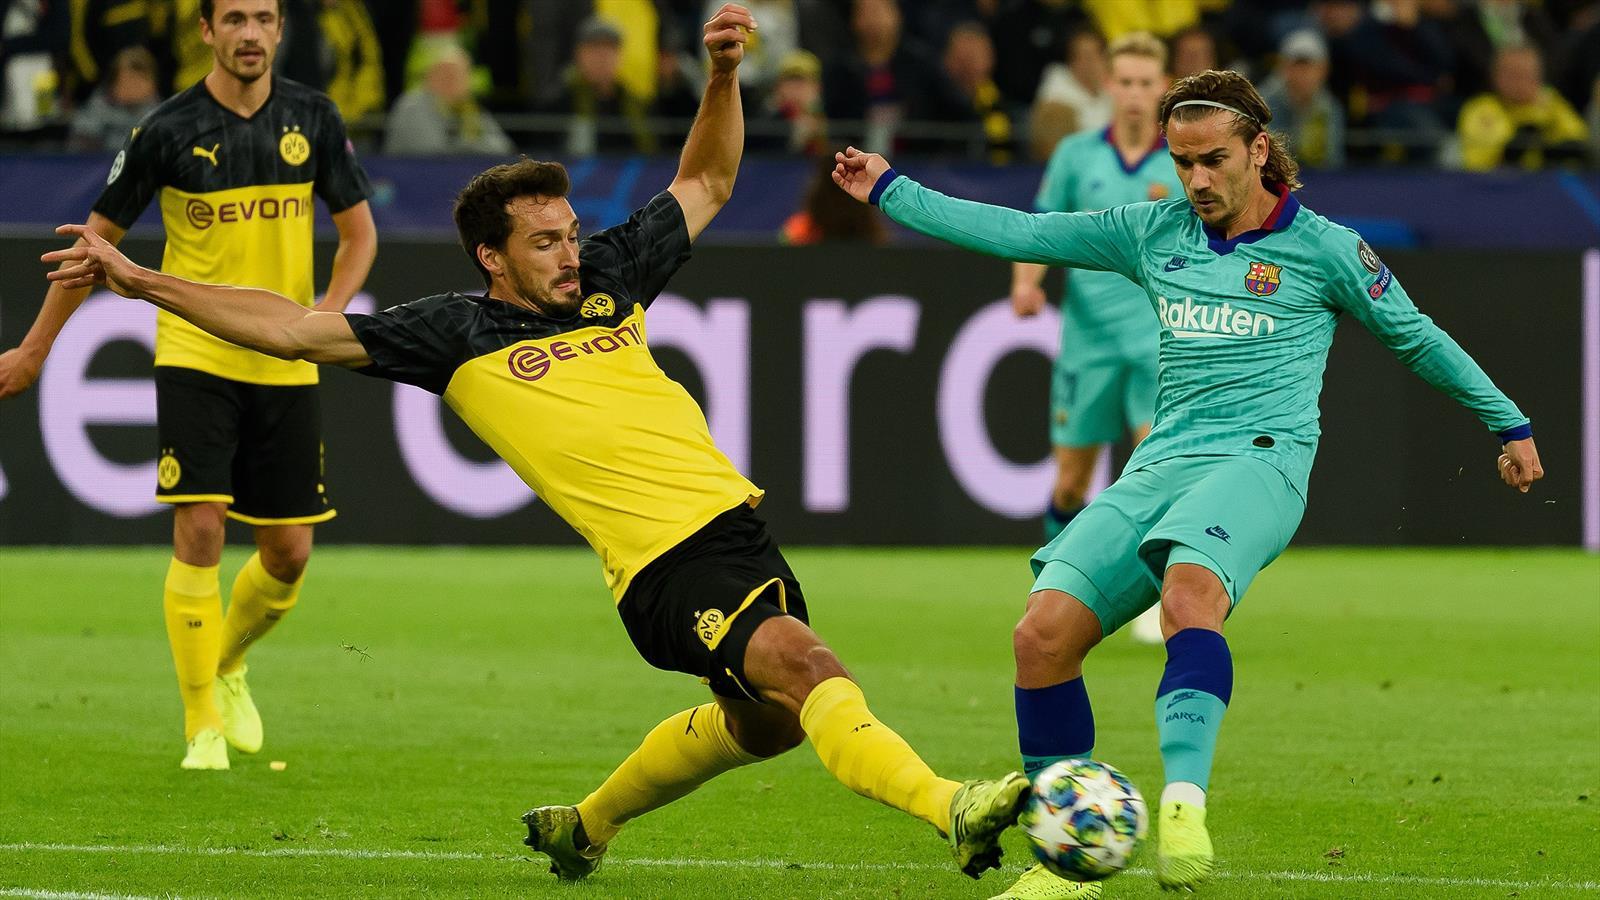 Dortmund Barcelona FuГџball